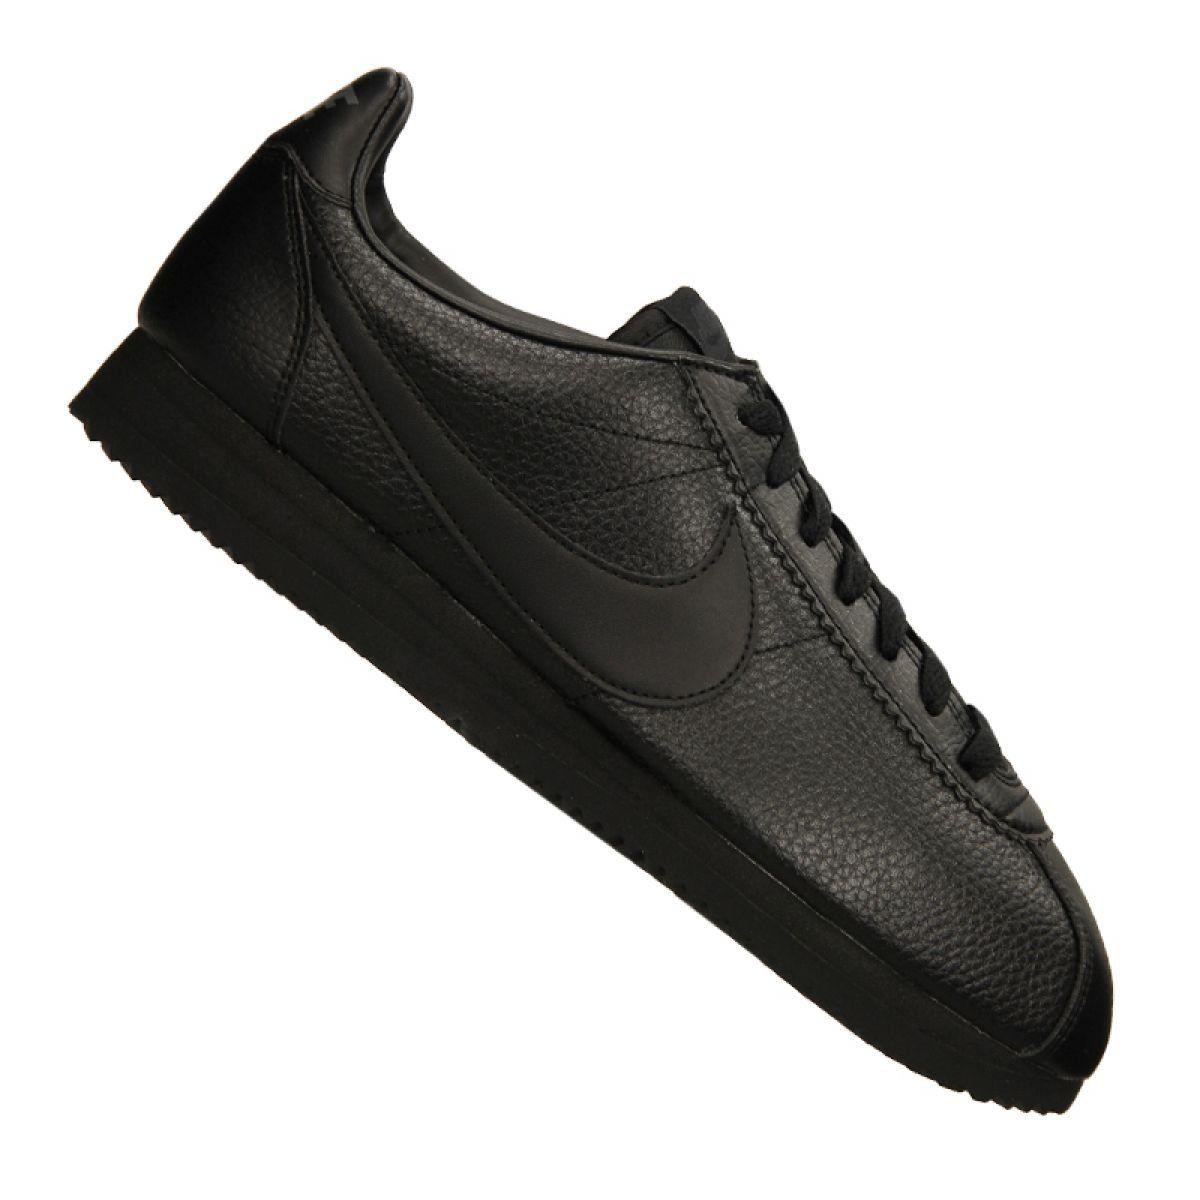 Buty Nike Classic Leather M 749571 002 Czarne Nike Classic Nike Classic Cortez Leather Black Shoes